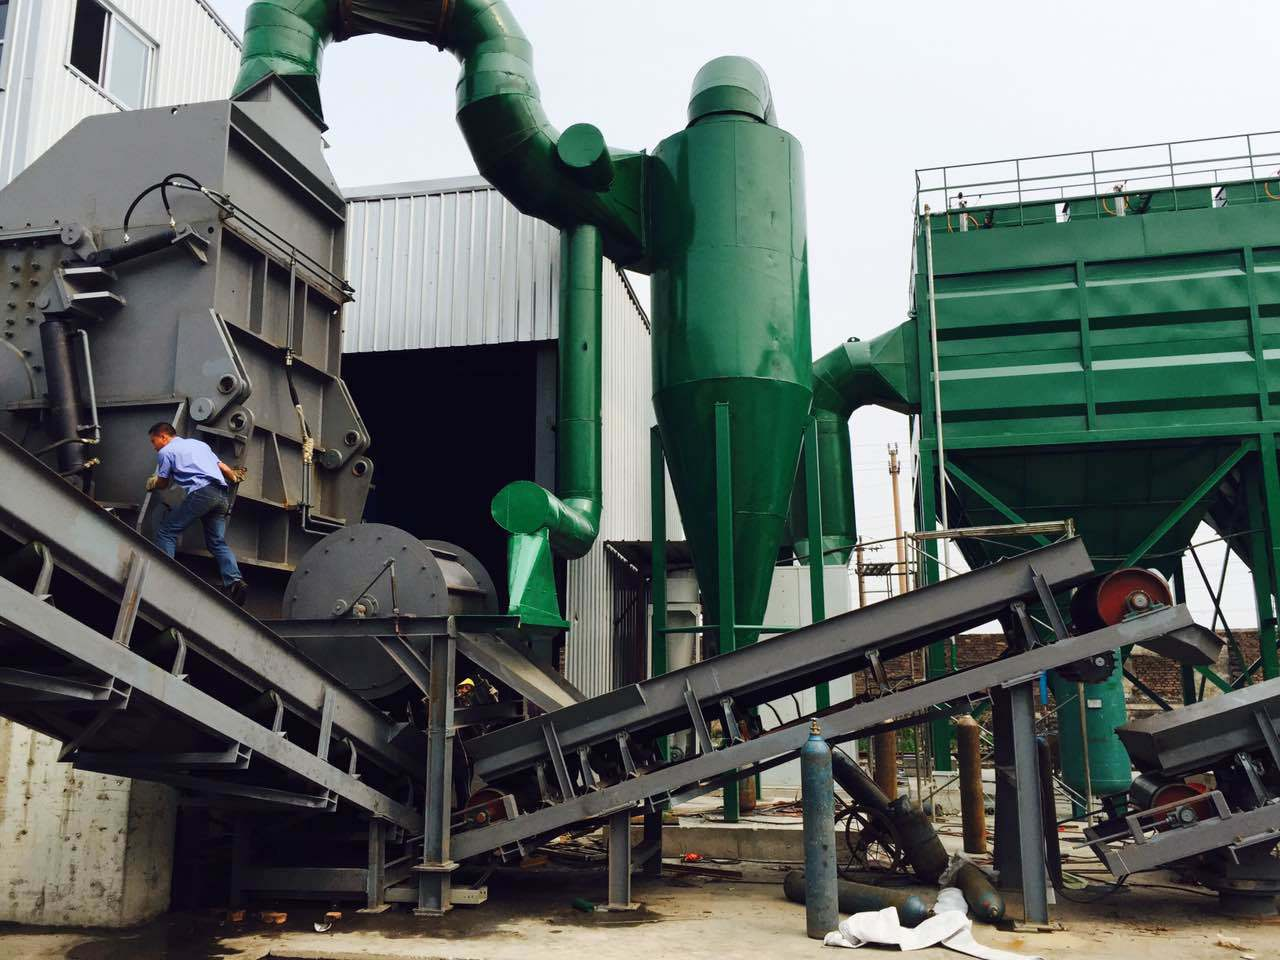 Psx-4500 Industrial Metal Shredder